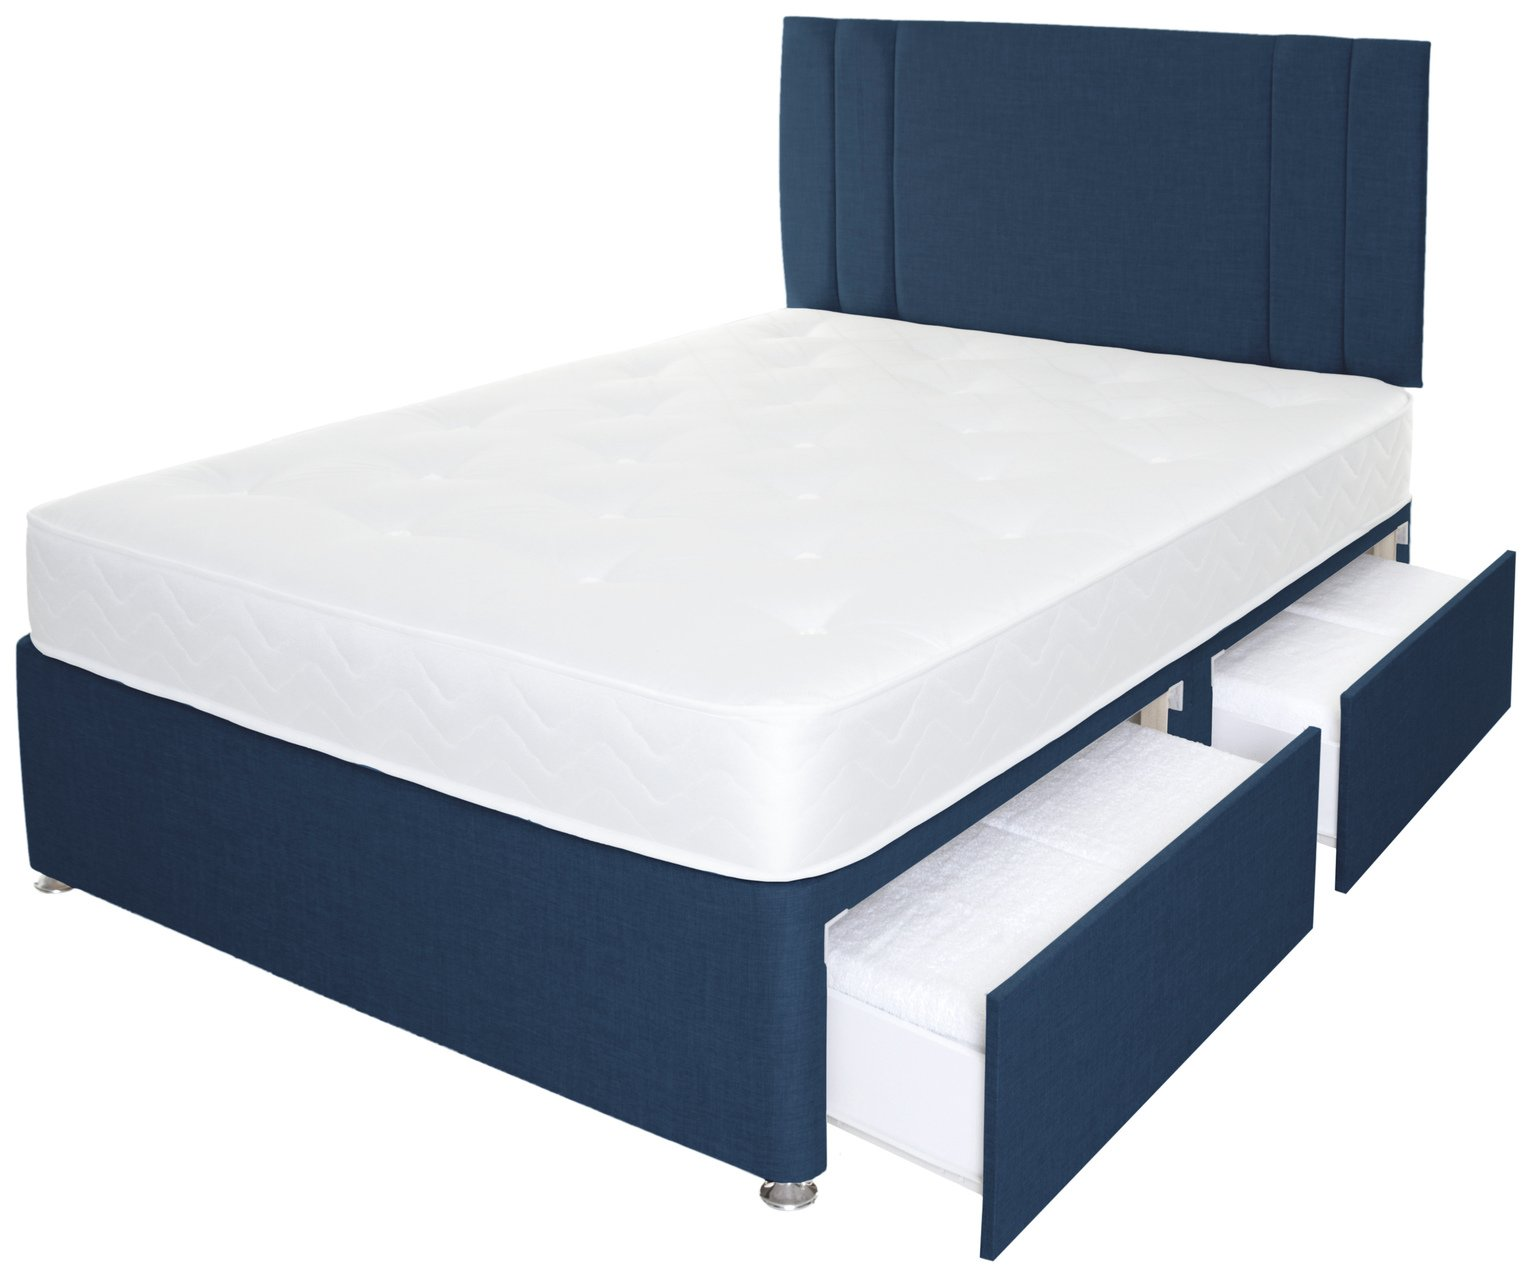 Airpsrung Henlow 1200 Pkt 4 Drw Divan Bed & Headboard - Blue at Argos